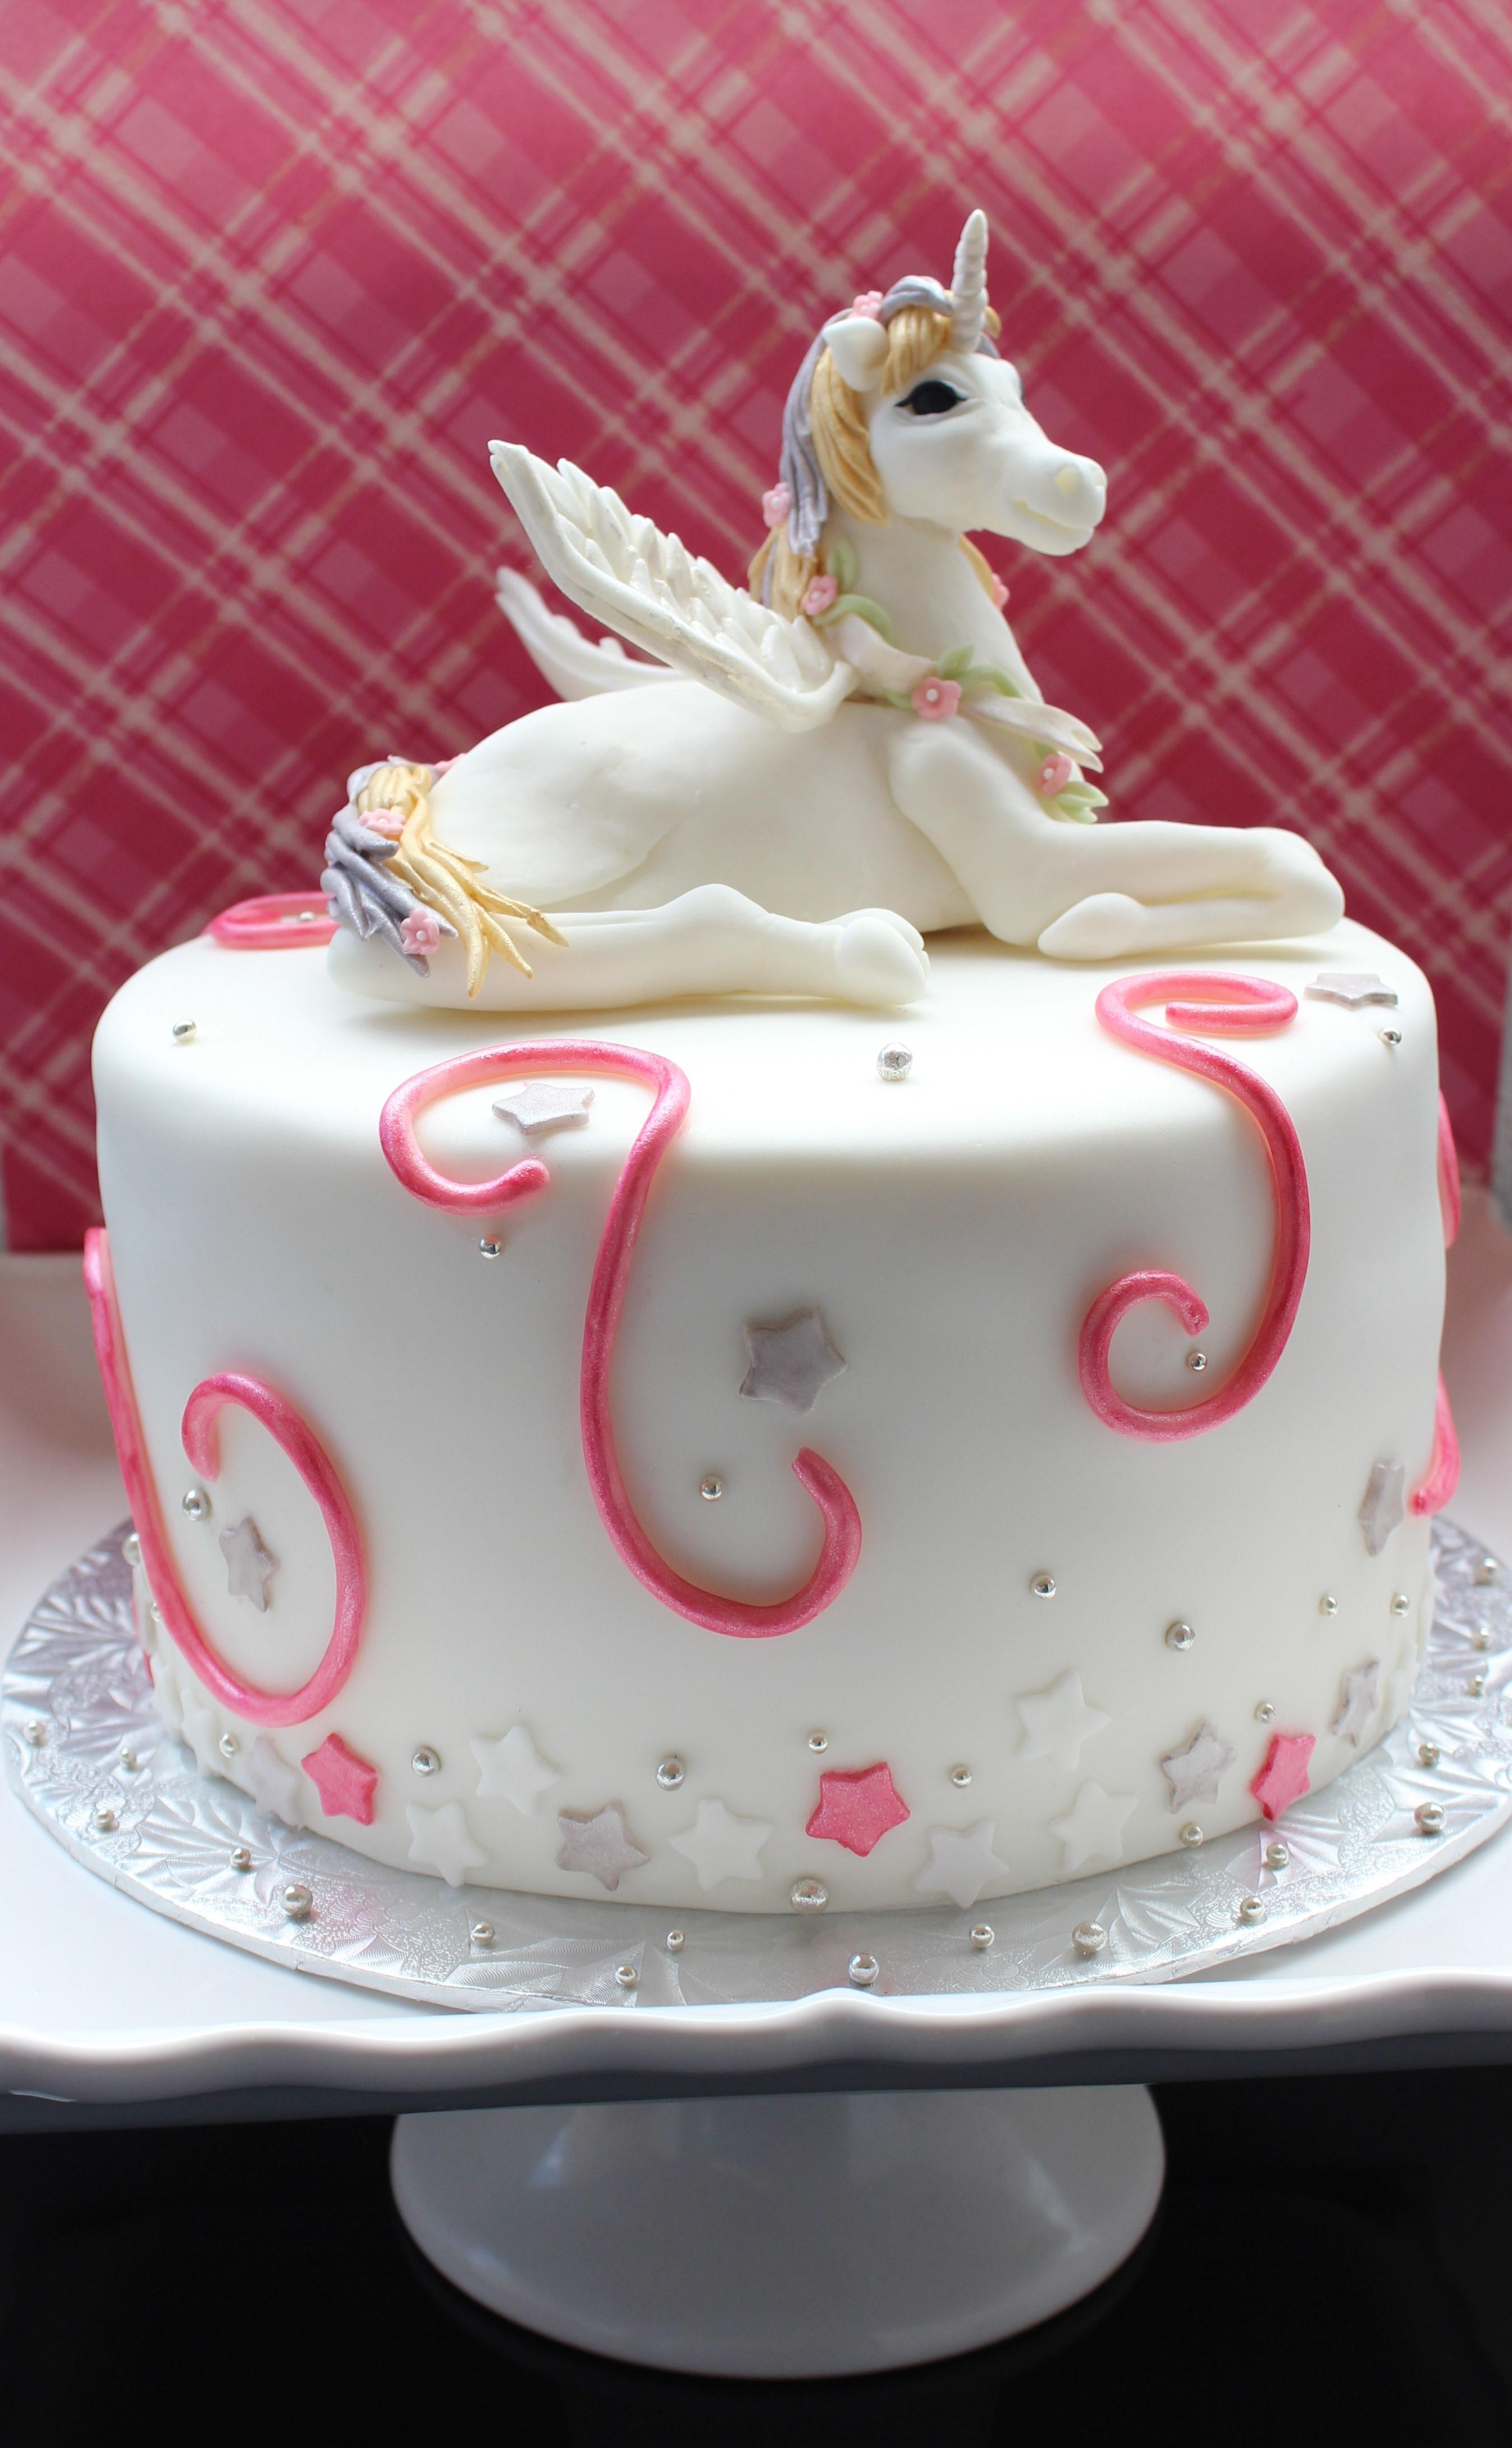 Unicorn Cake For A Sweet Little Girl Cakecentral Com